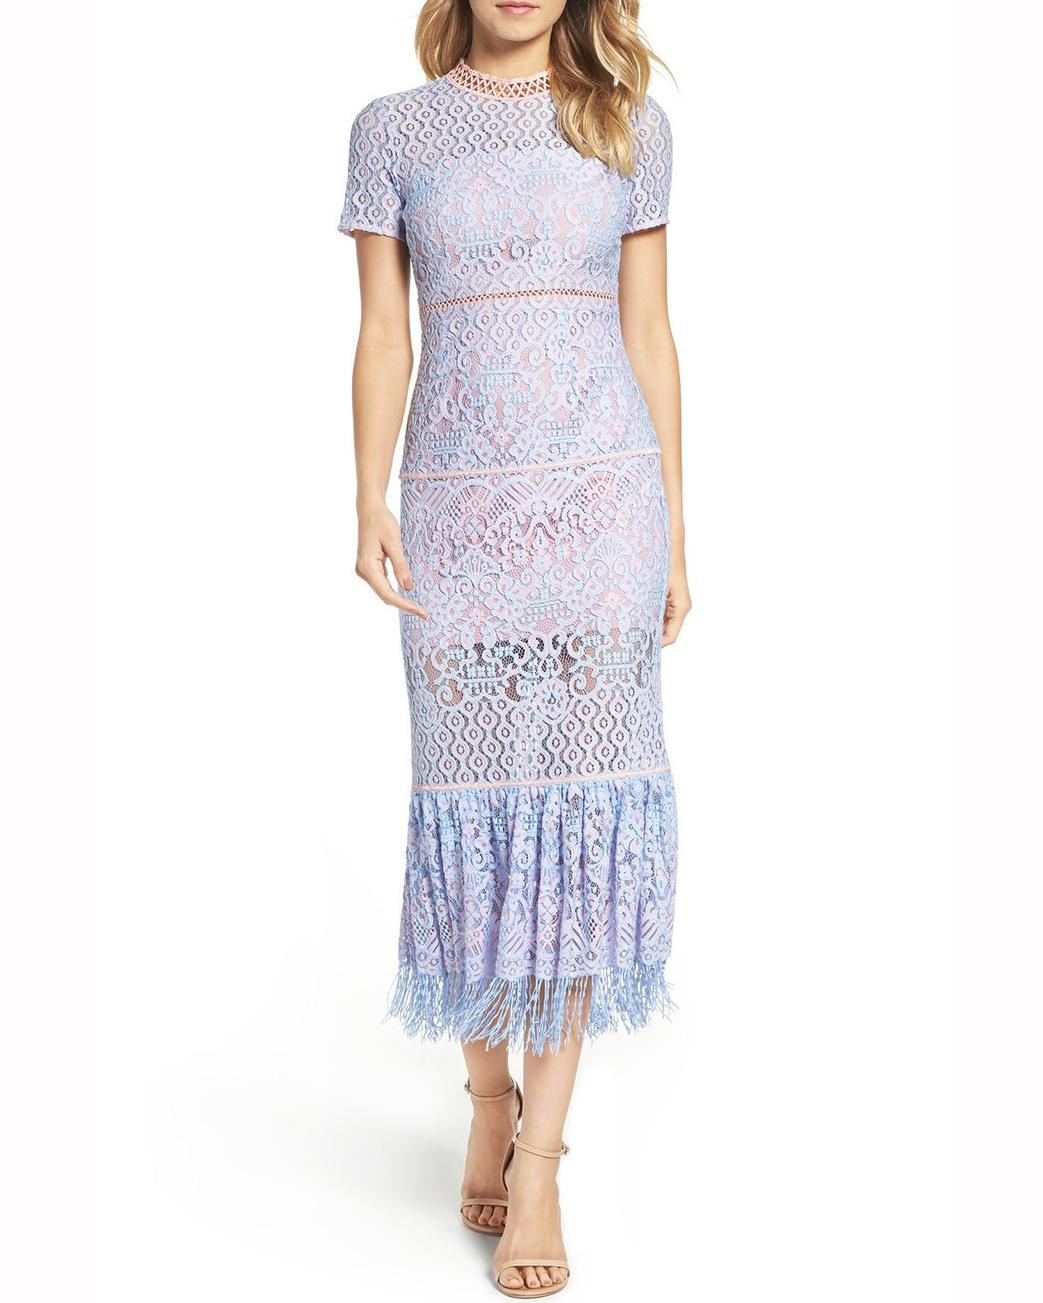 peek-a-boo-bridesmaid-dress-foxiedox-flourite-crochet-0117